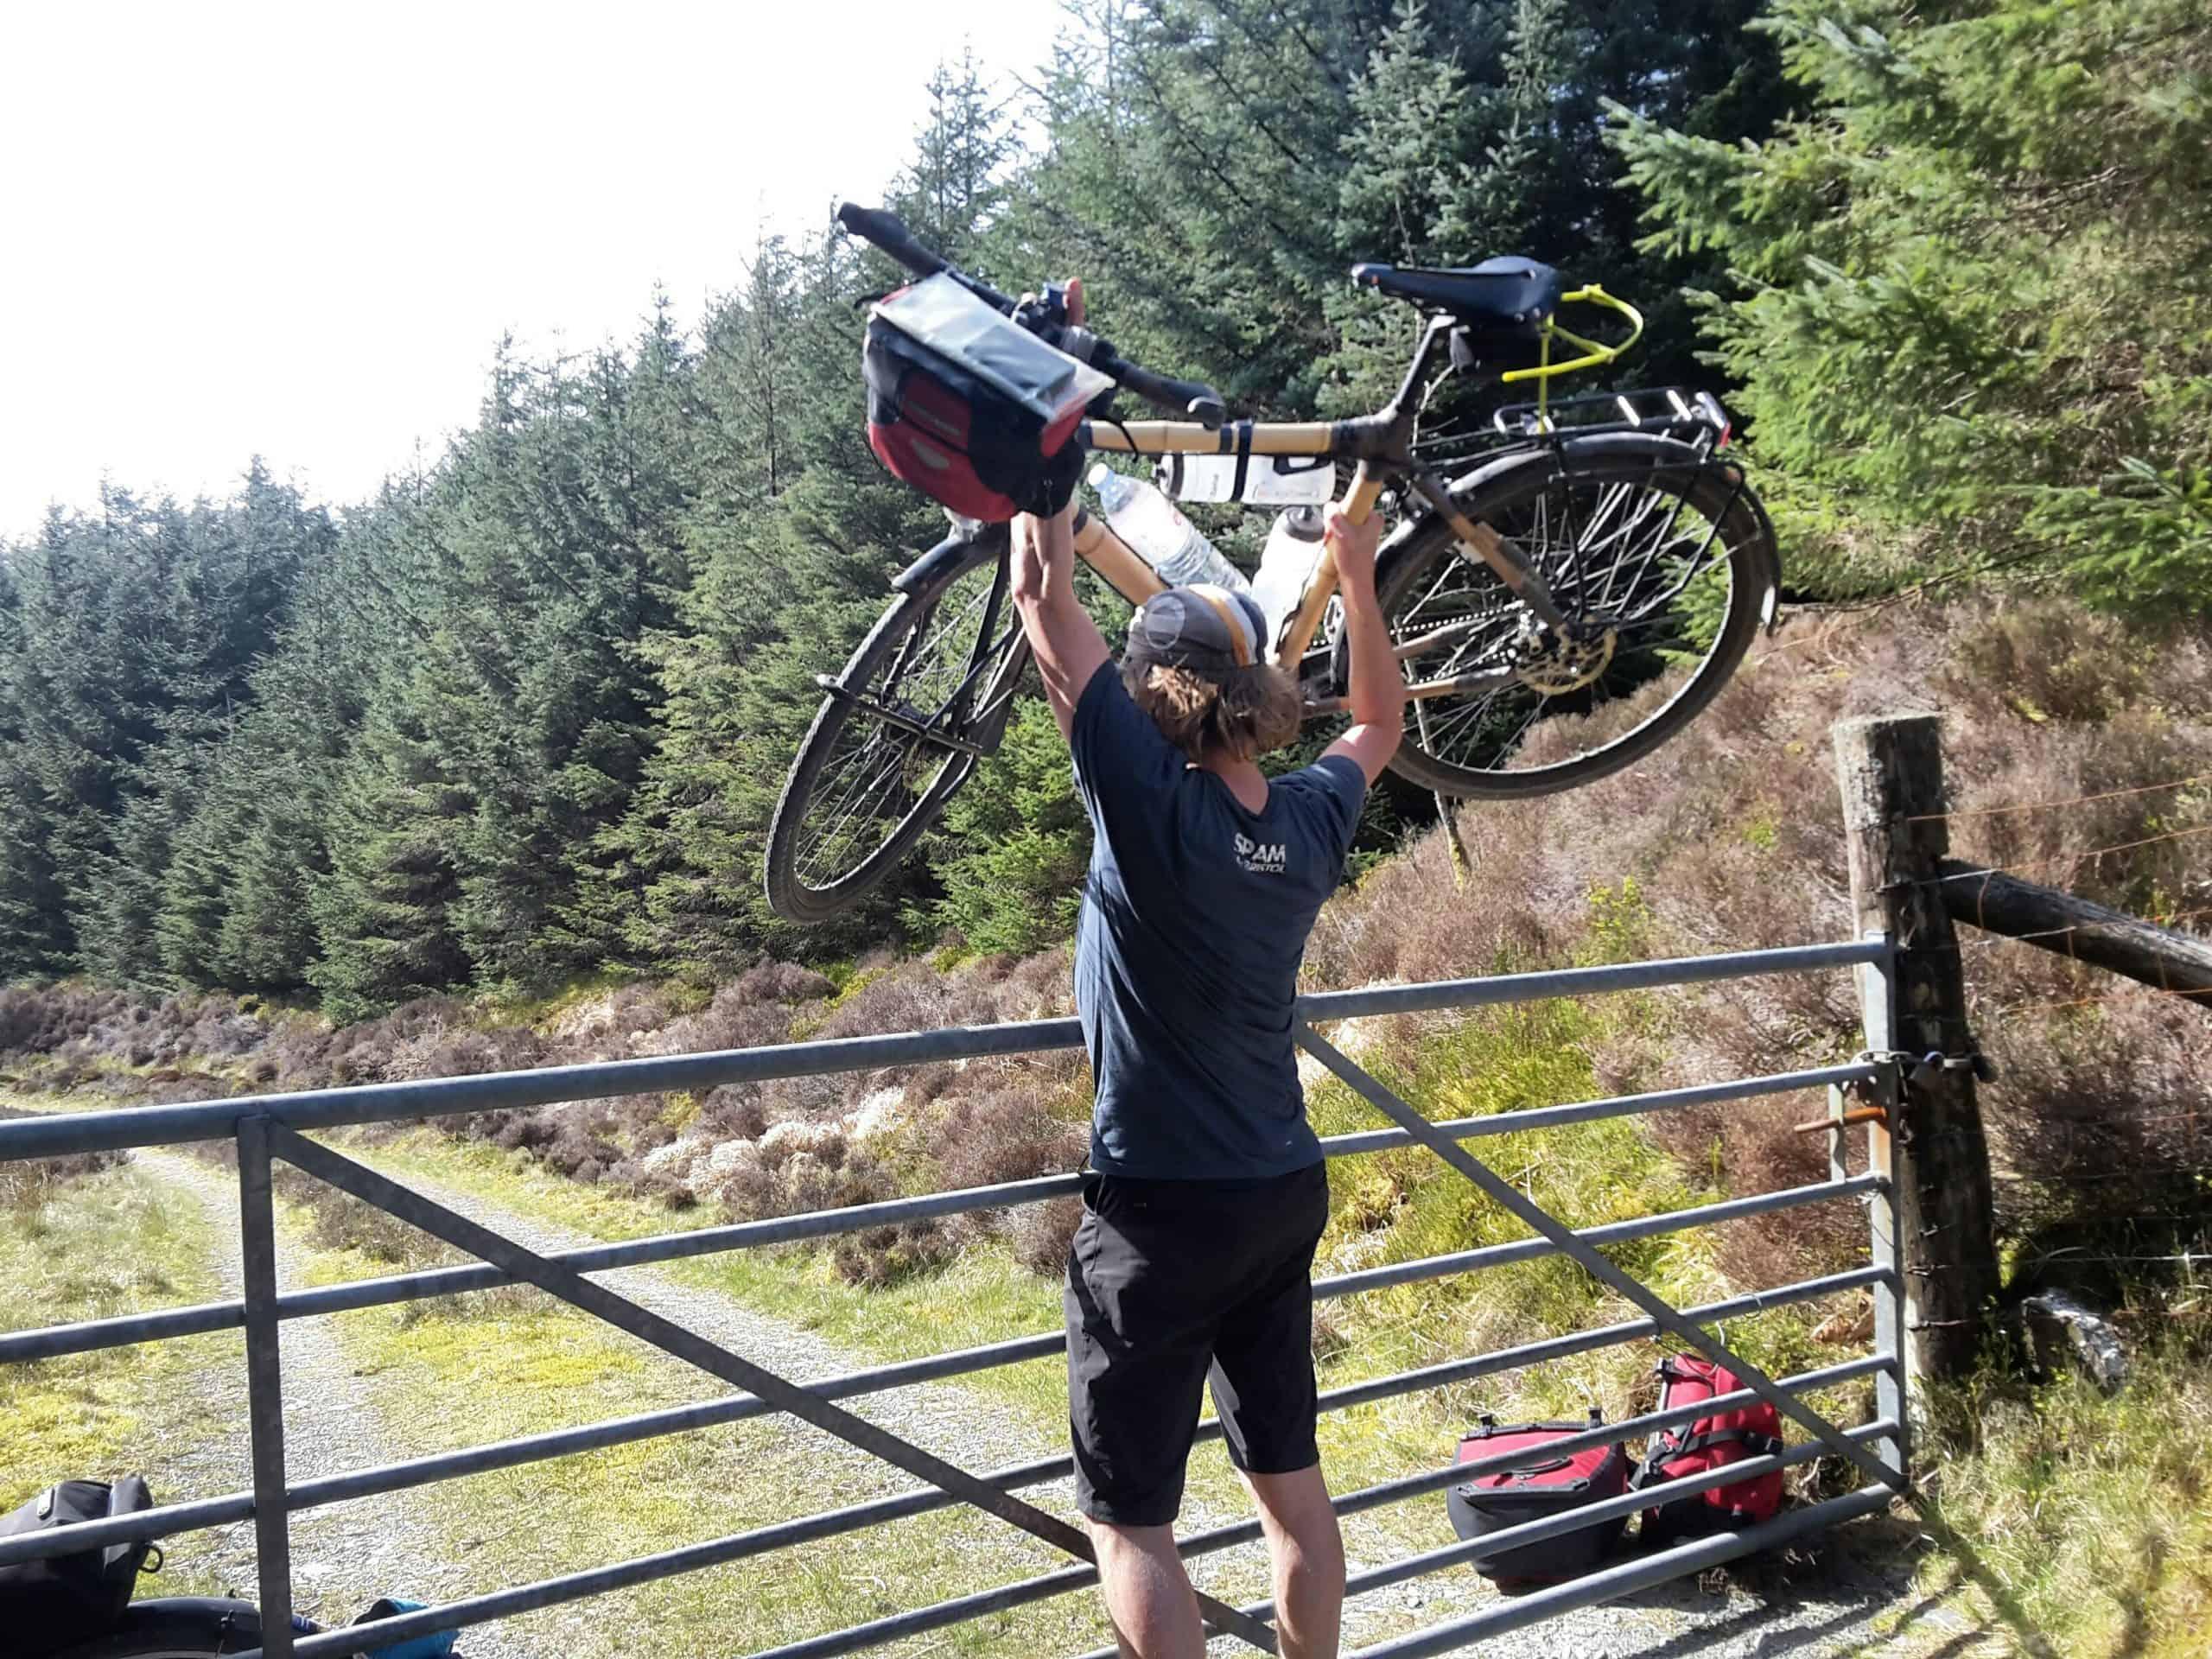 Snowdonia: Climbing Up, Riding Back 93